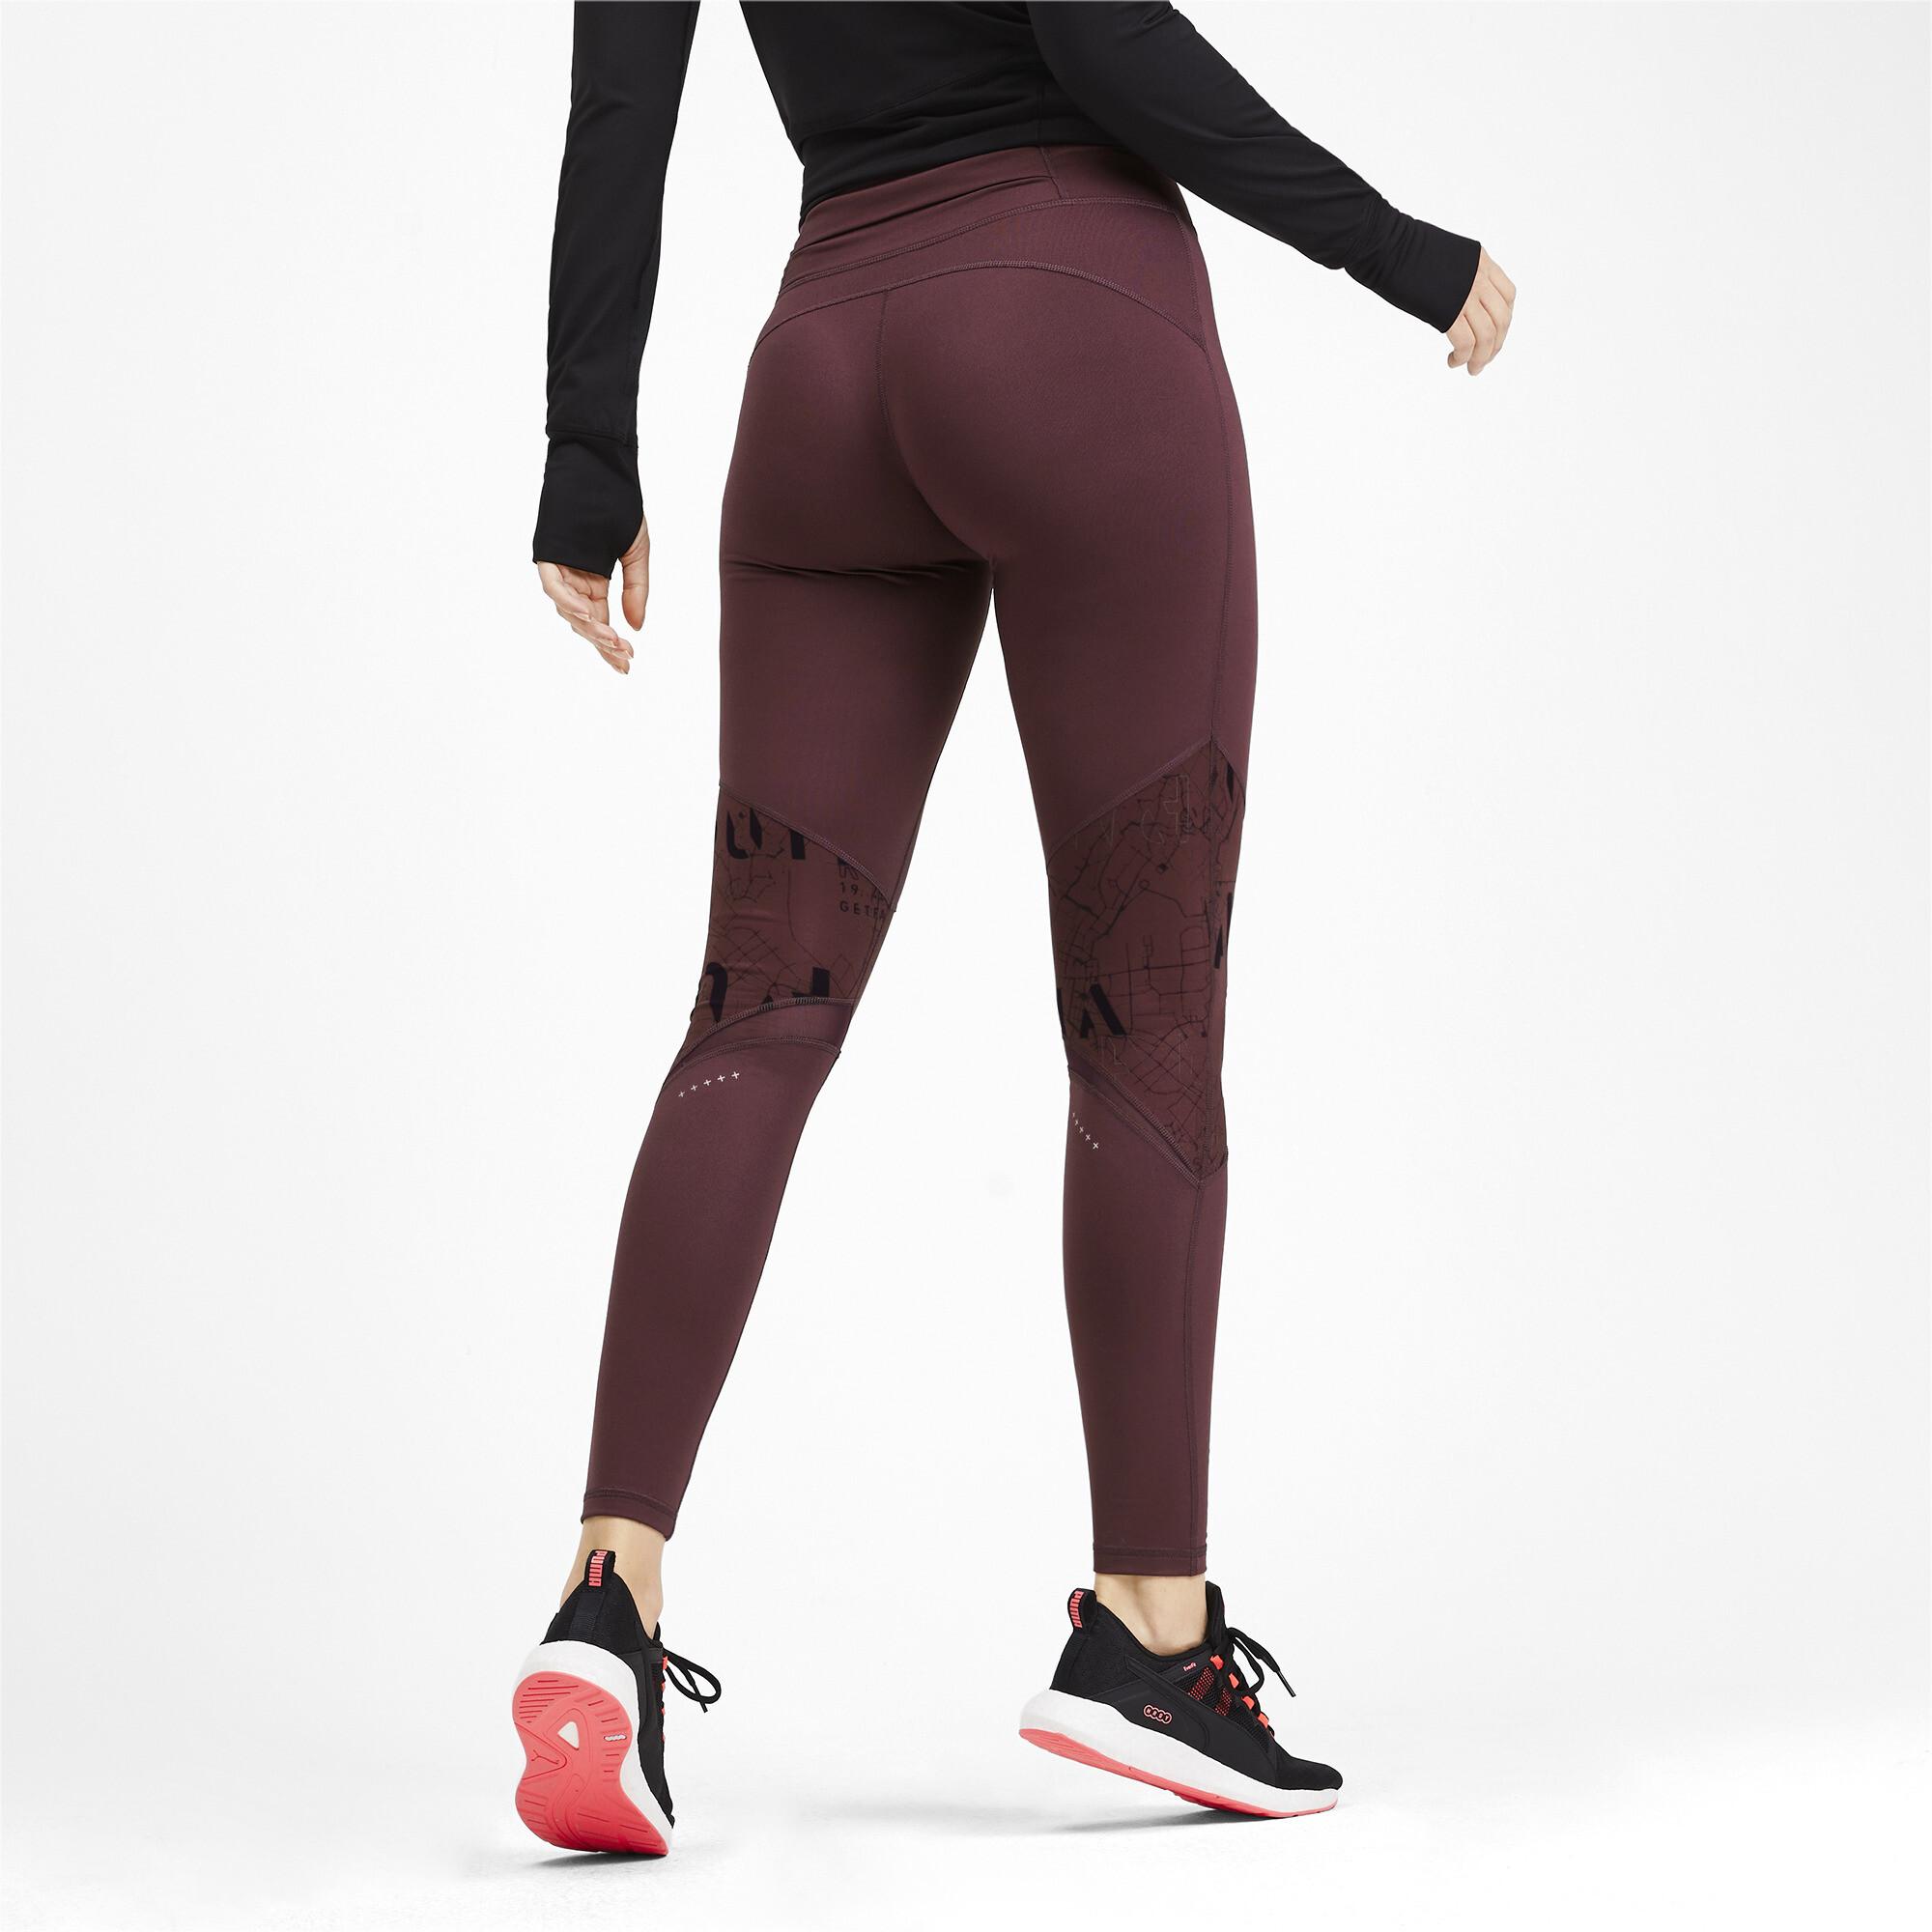 PUMA-Graphic-Women-039-s-Leggings-Girls-Running thumbnail 10